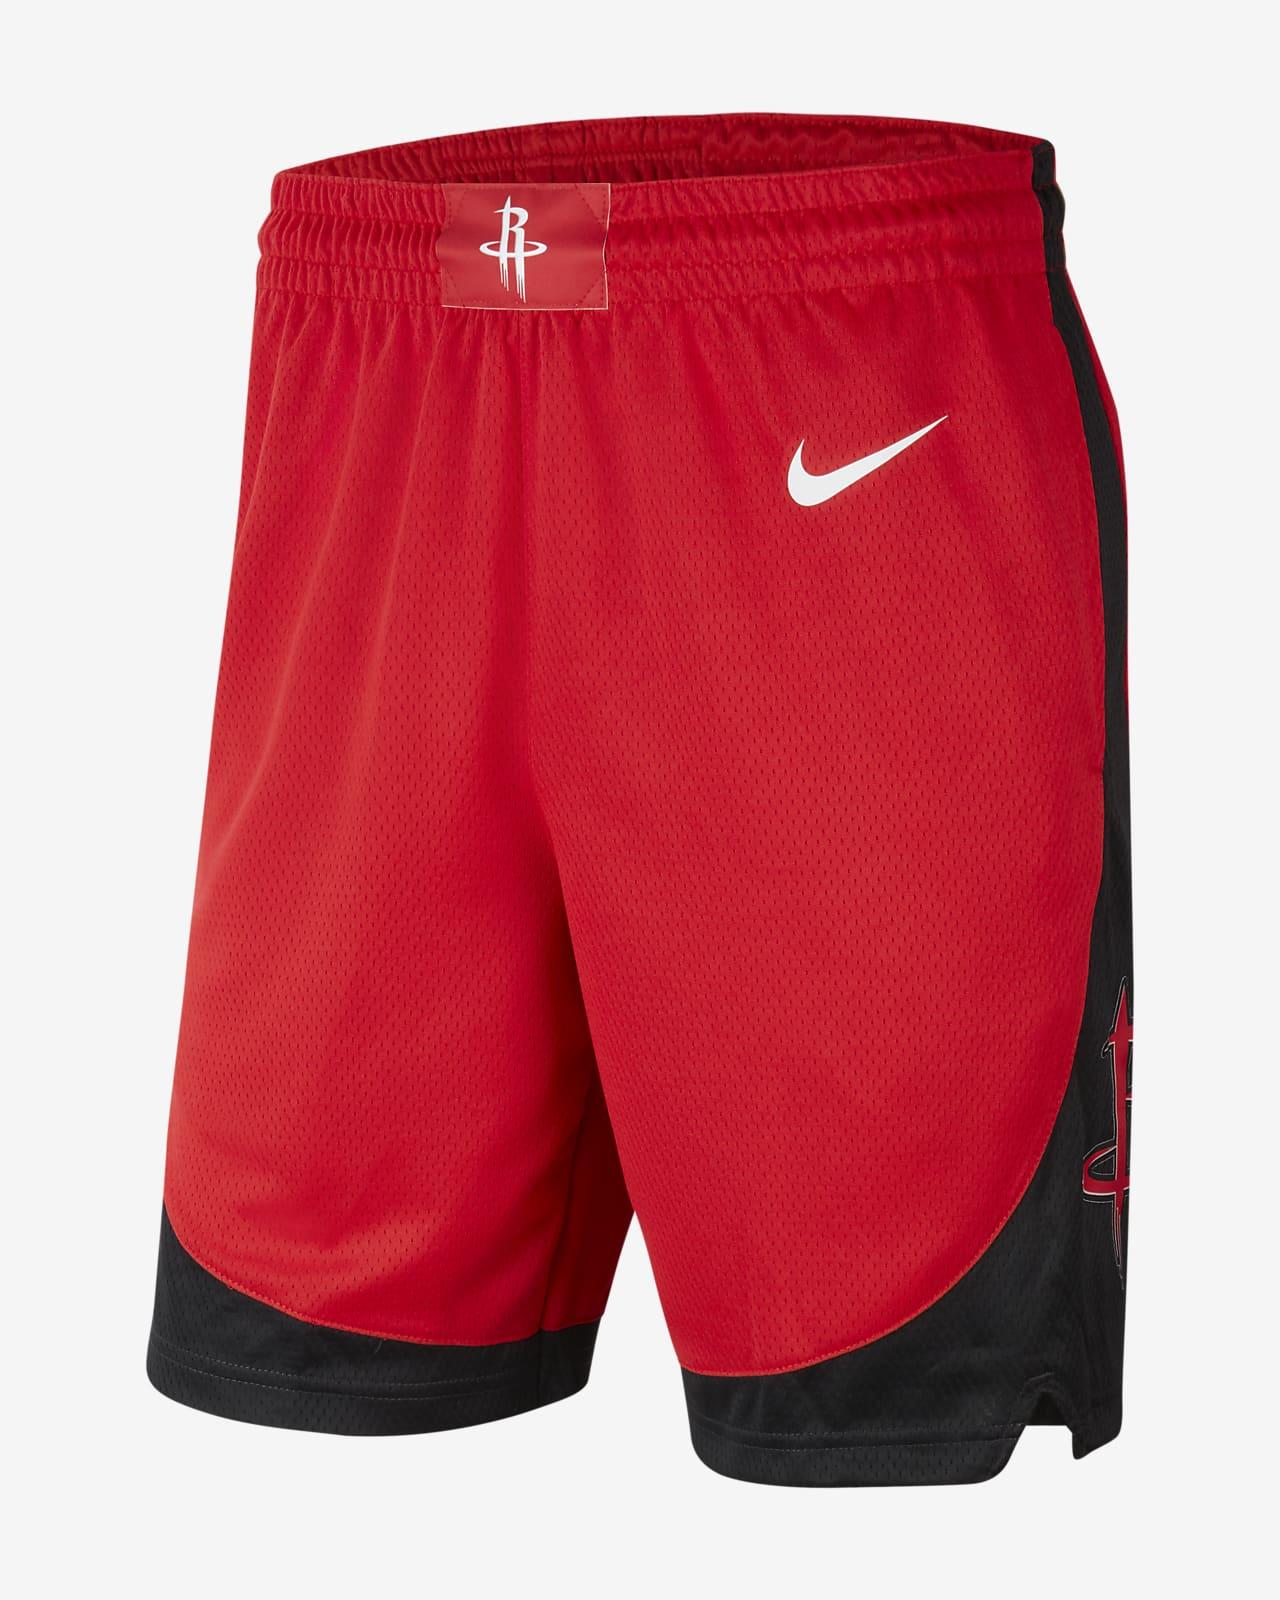 Houston Rockets Nike Icon Edition Swingman NBA-s férfi rövidnadrág